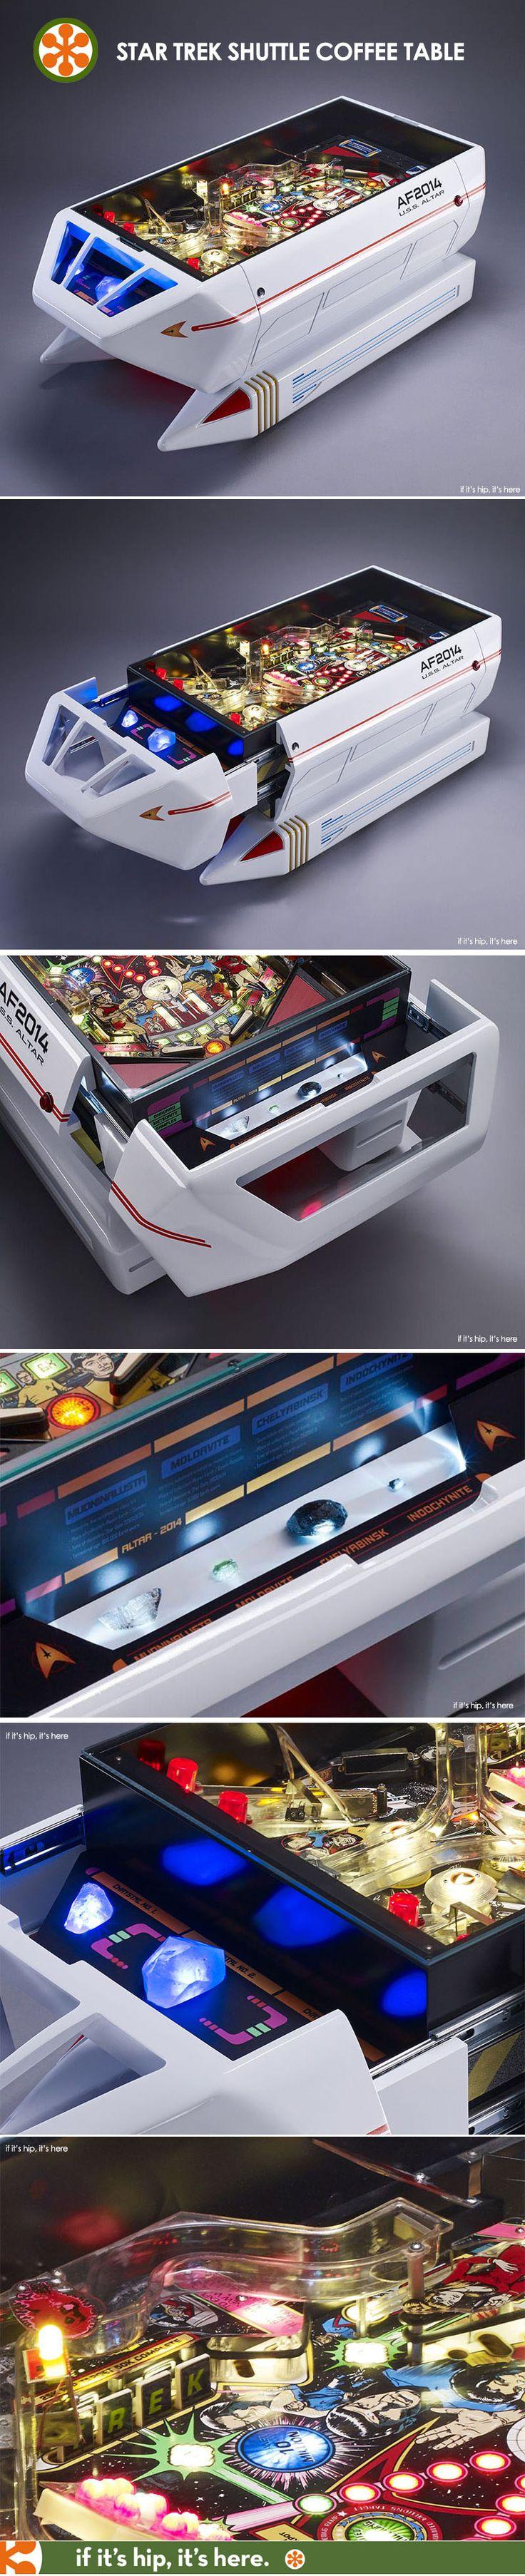 An Interactive Star Trek Shuttle Coffee Table? Make It So!